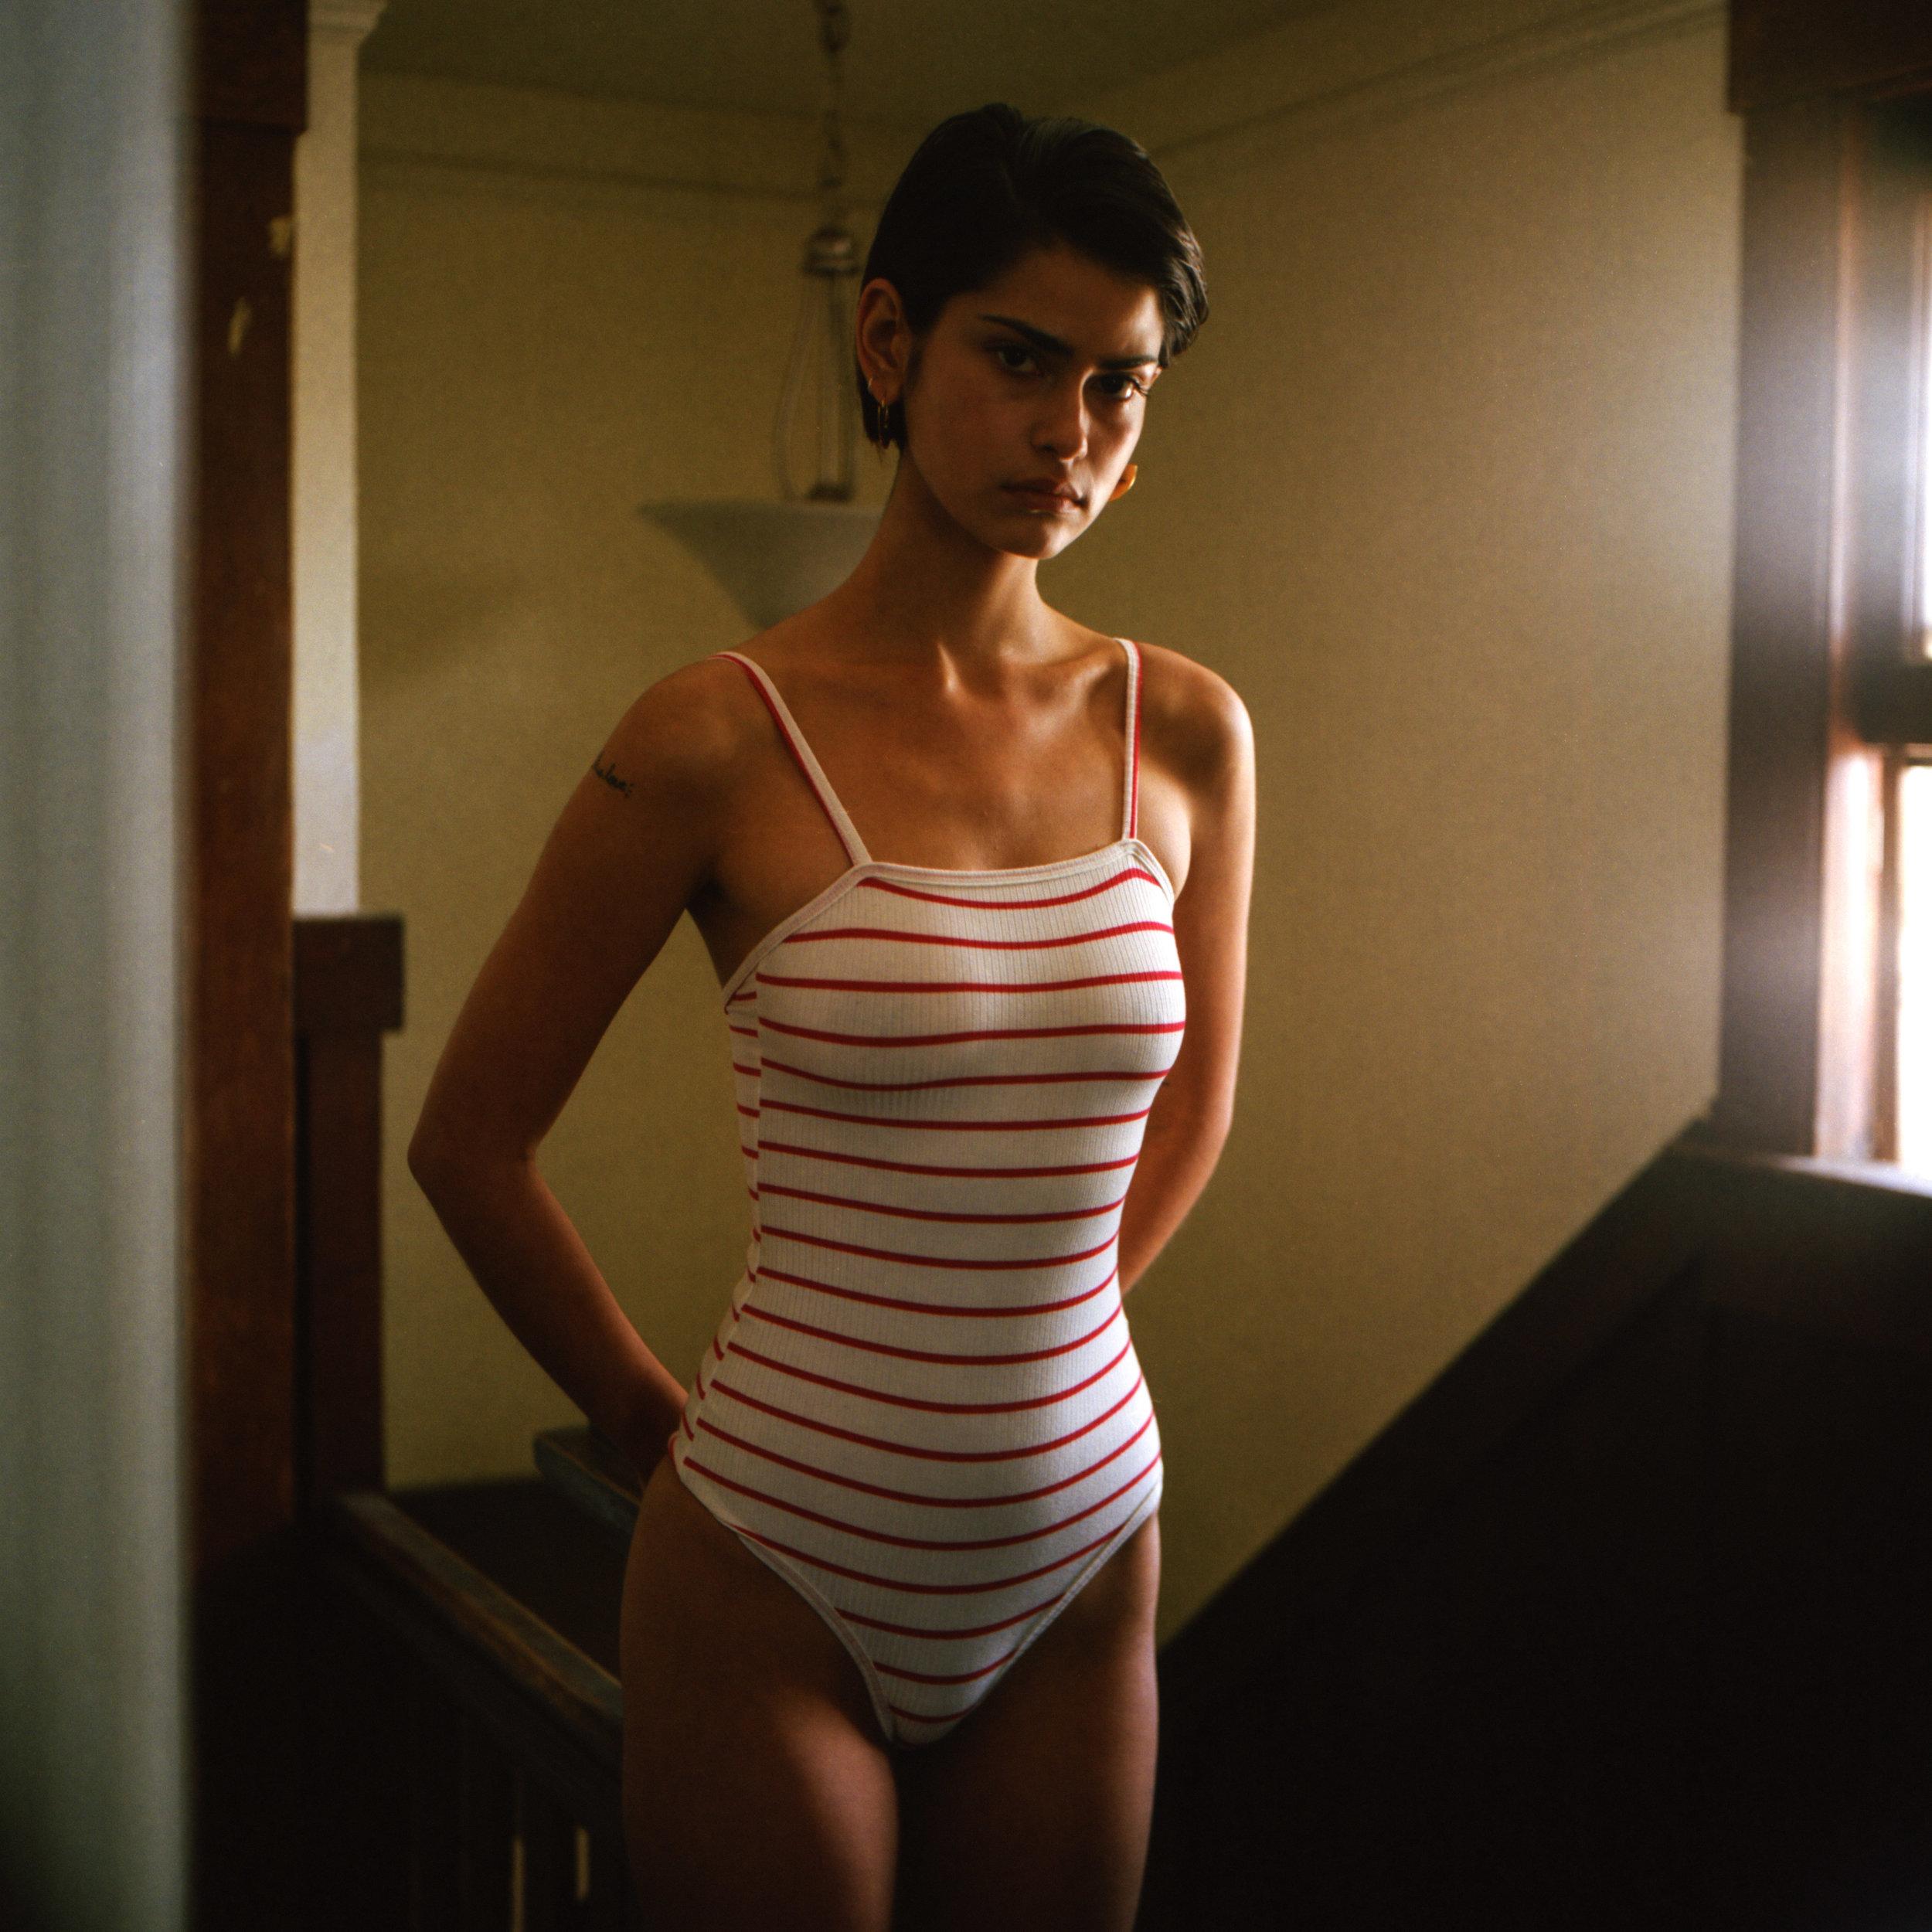 Hannah Kleit by Danny Lane